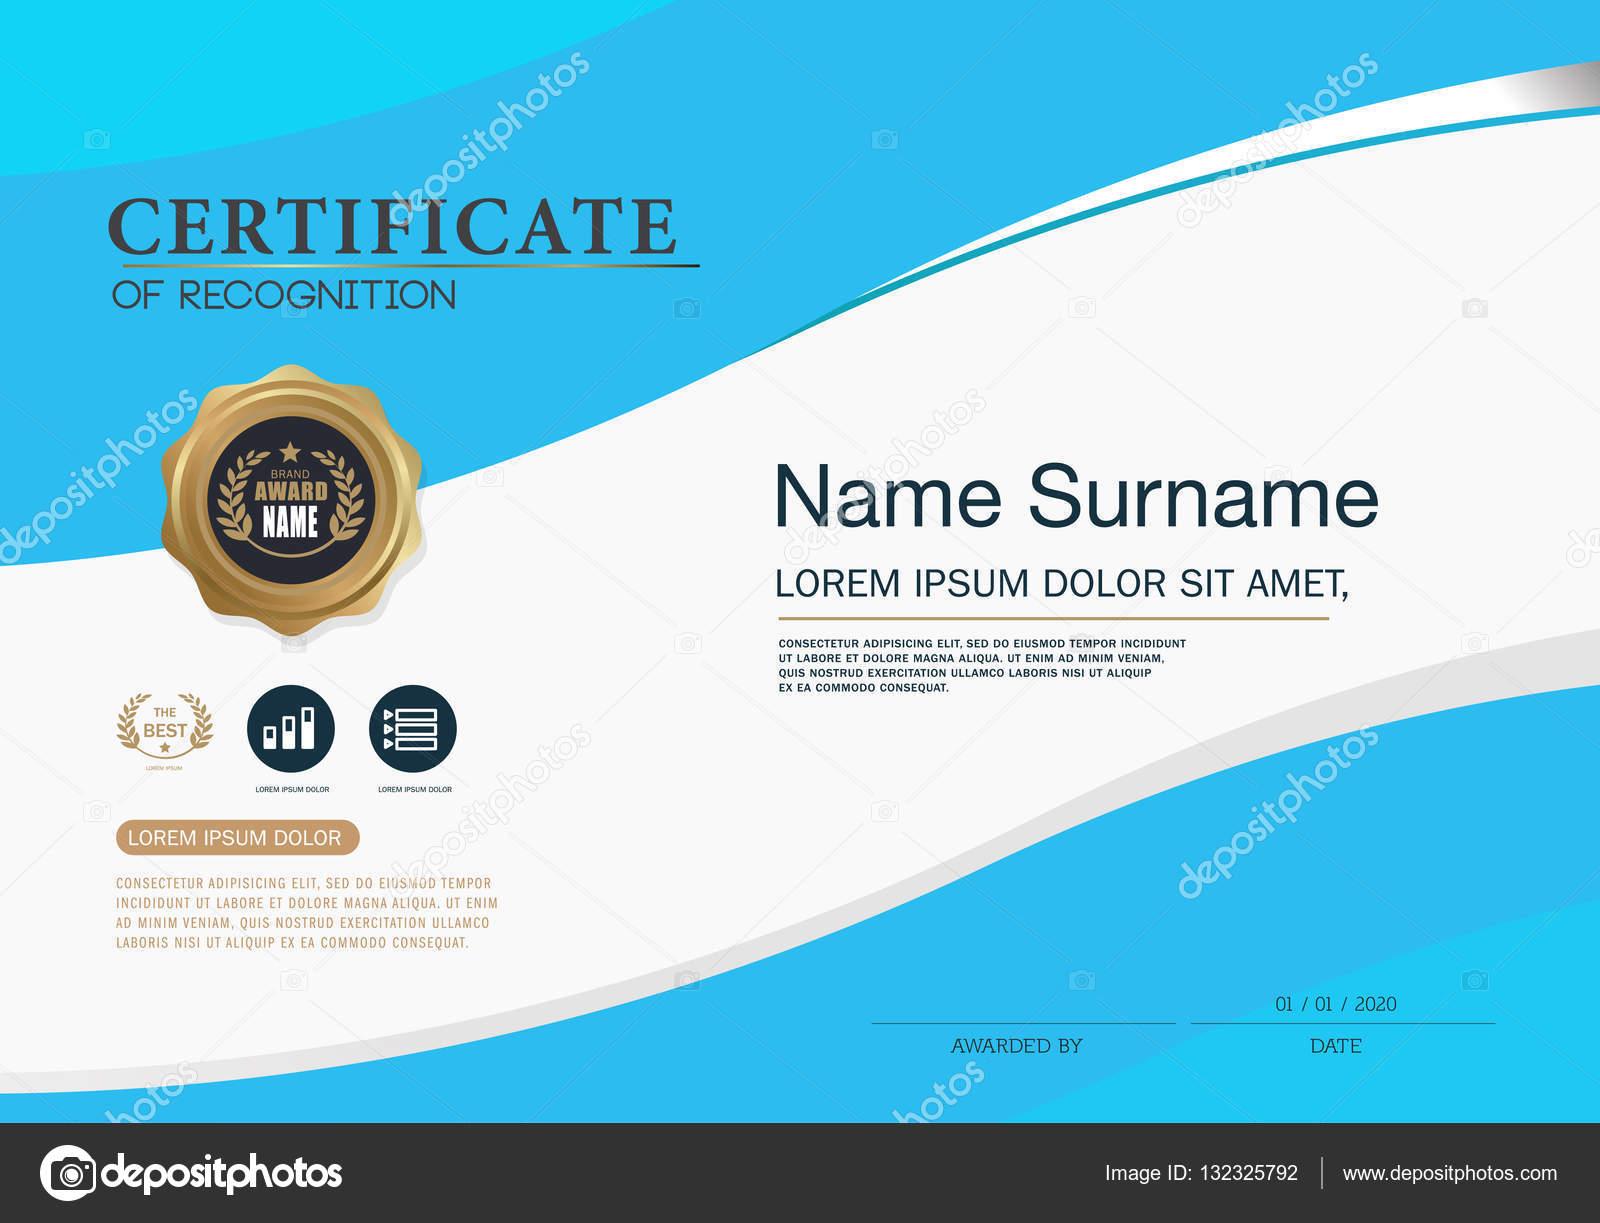 Zertifikat Design Vorlage Layout-Vorlage im A4-Format — Stockvektor ...